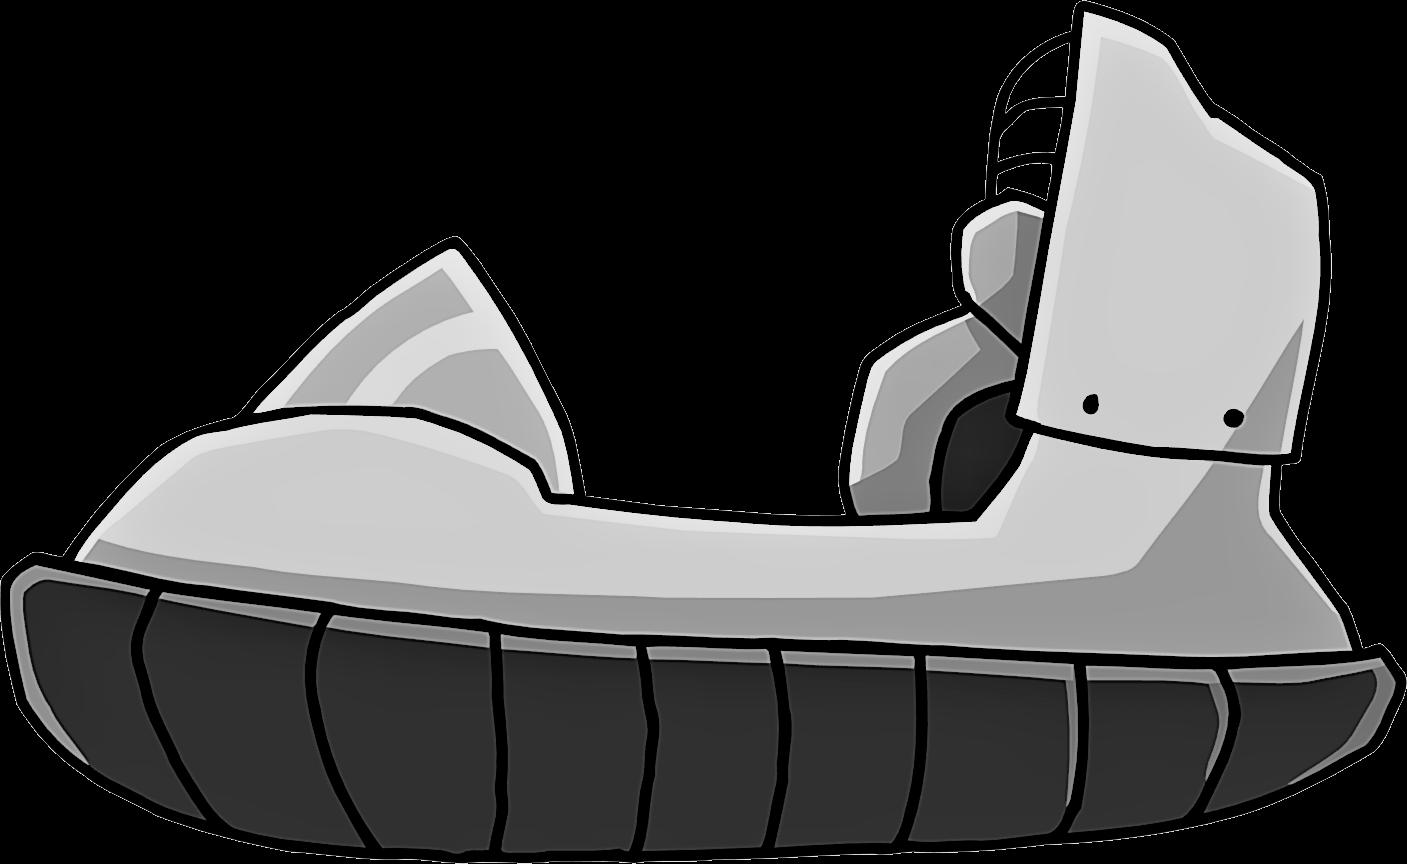 Hovercraft (2)